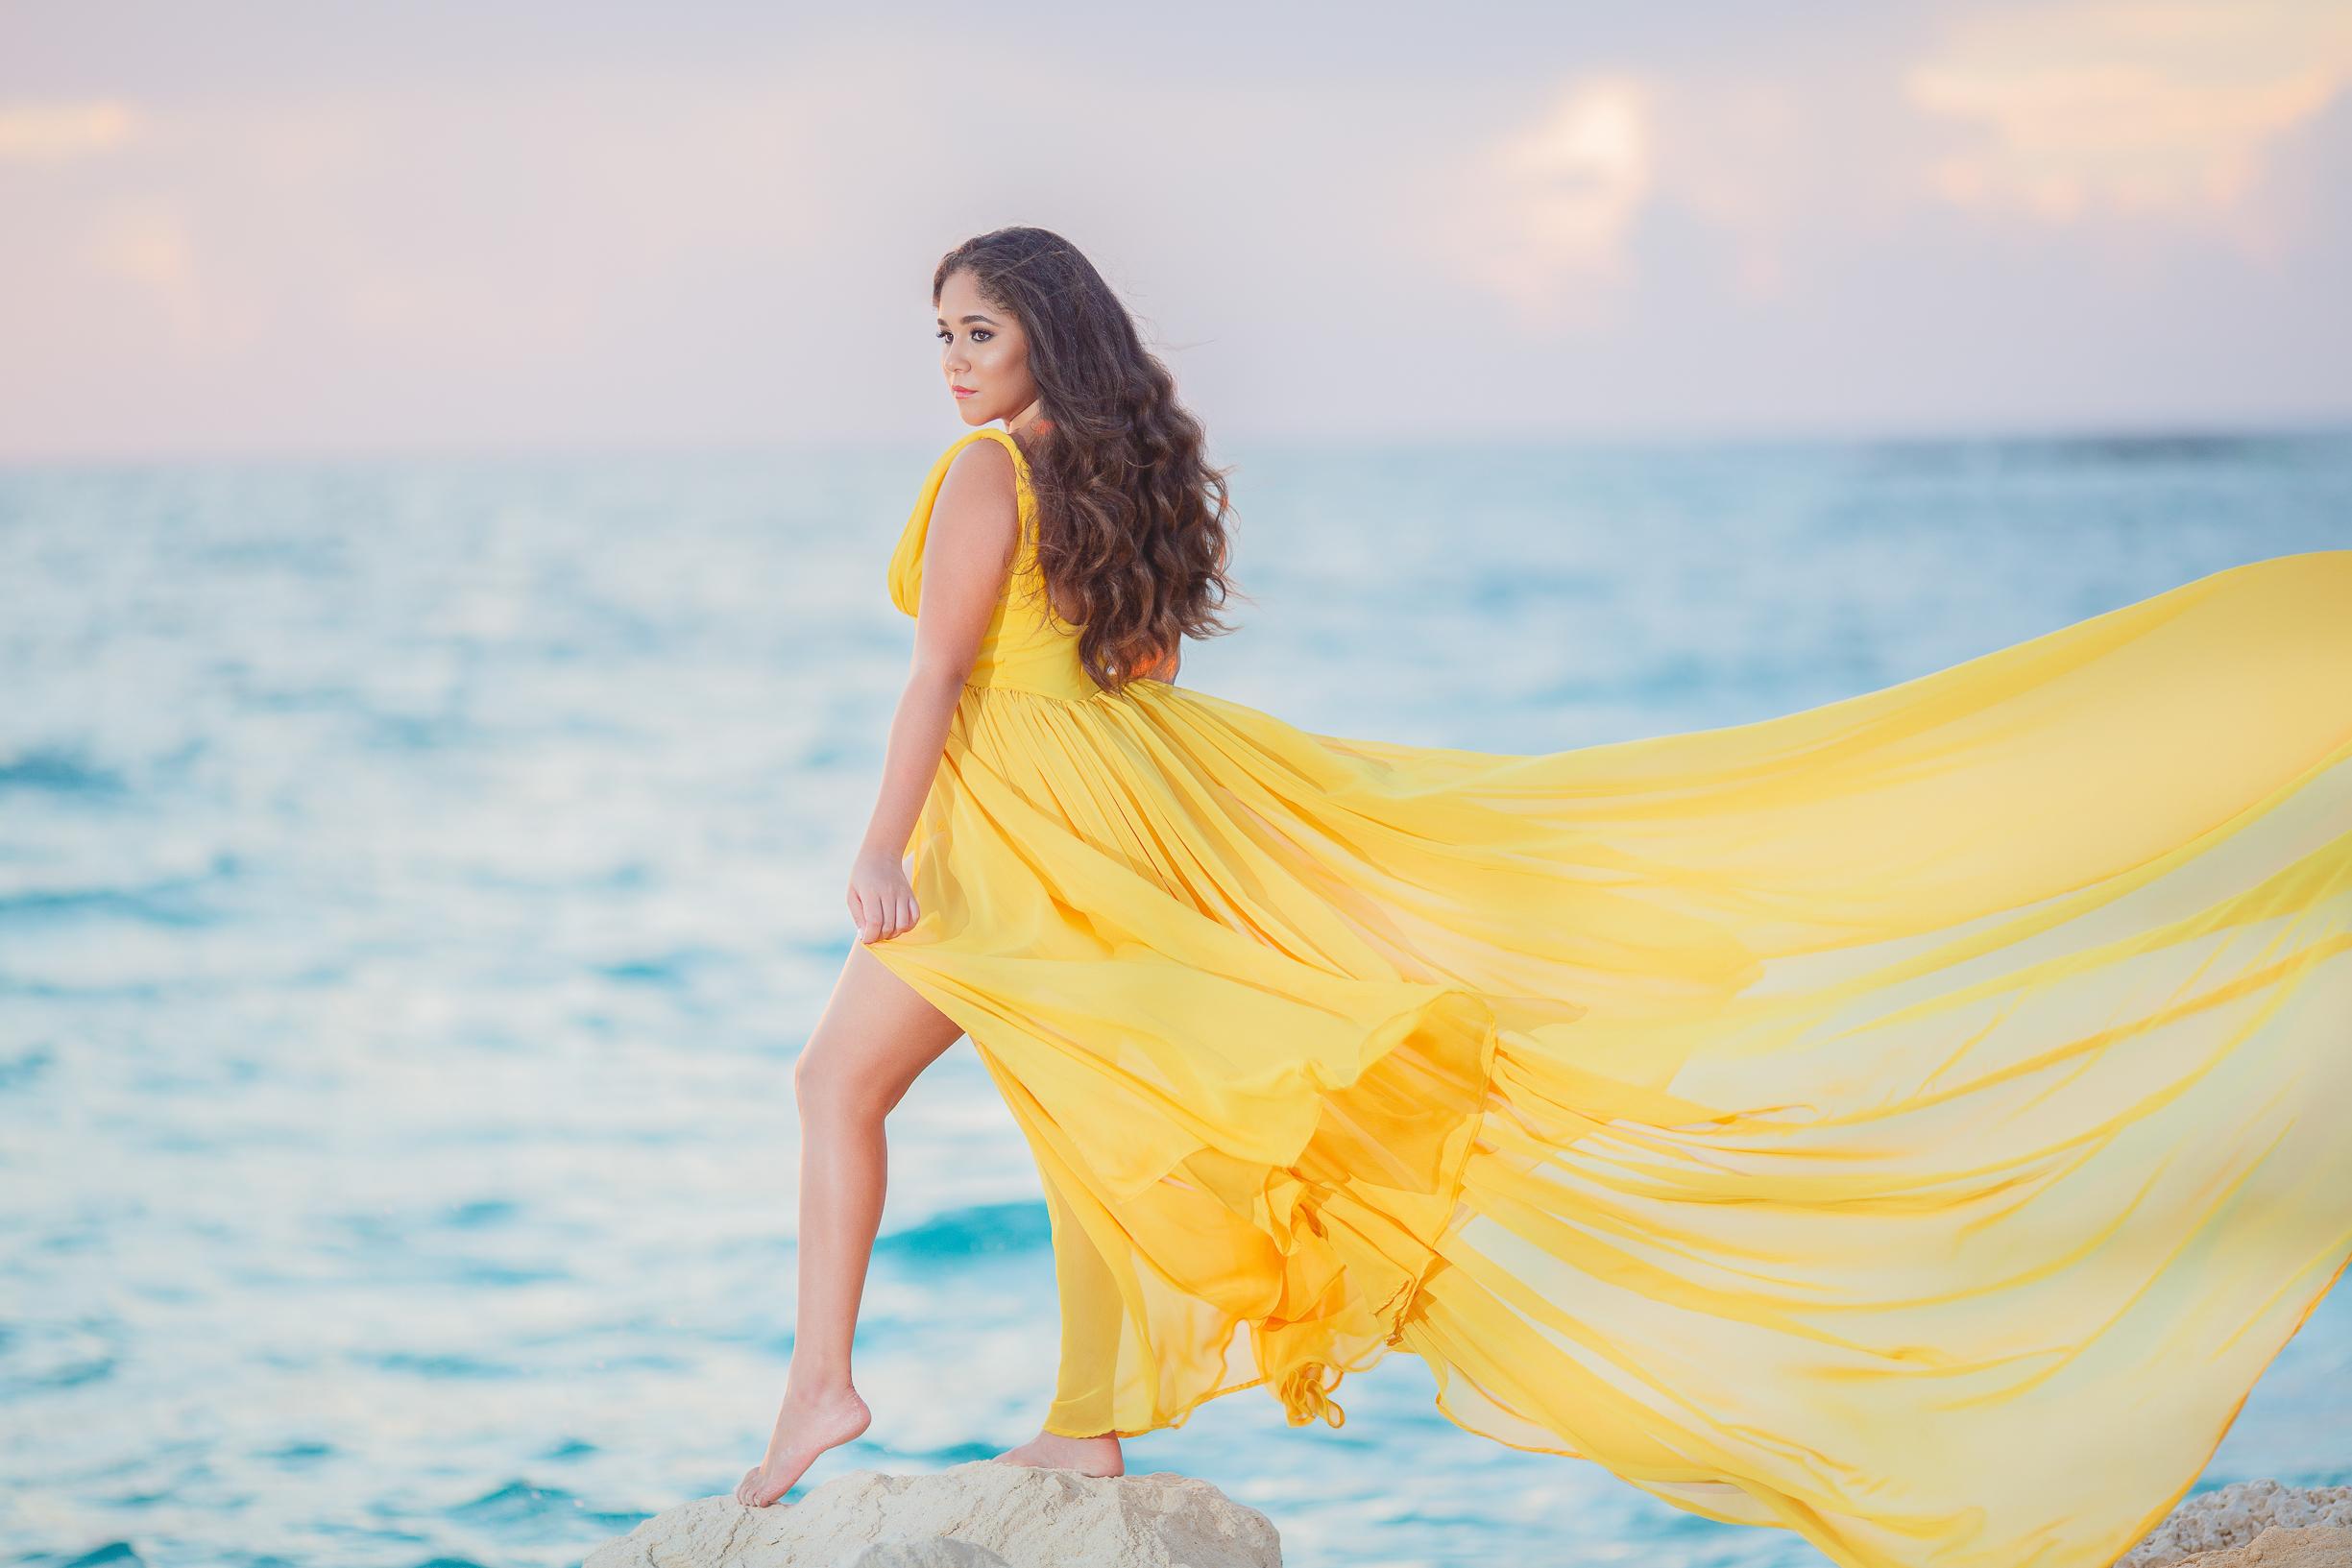 Miami Quinceanera Photographer - Destination Quince Photographer Bimini